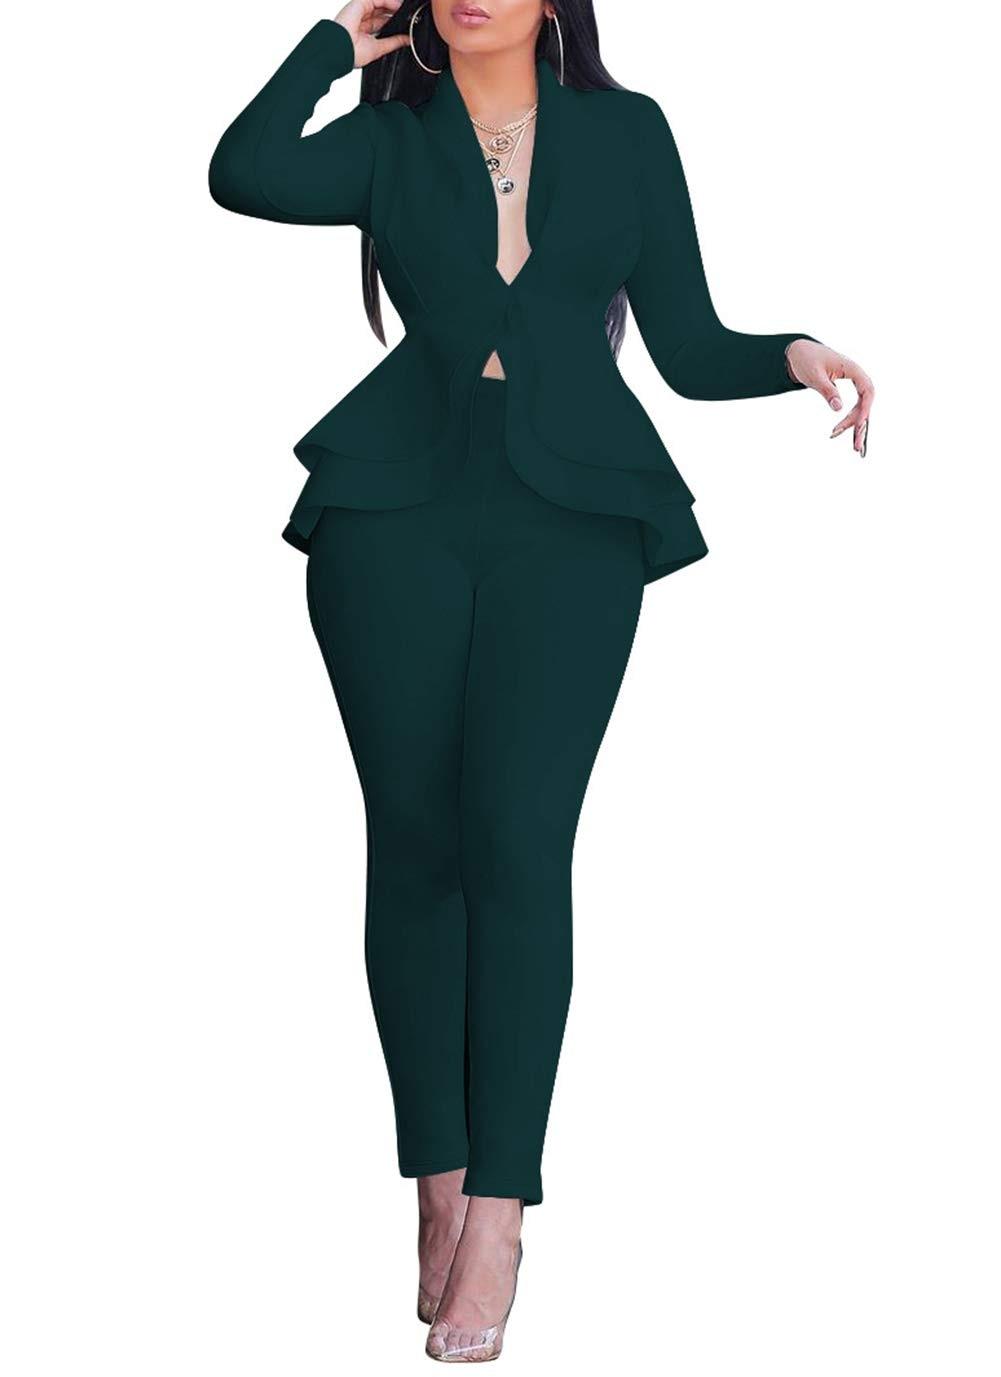 Salimdy مثير 2 قطعة ملابس للنساء طويلة الأكمام الصلبة السترة مع السراويل مجموعات عادية أنيقة بدلة عمل